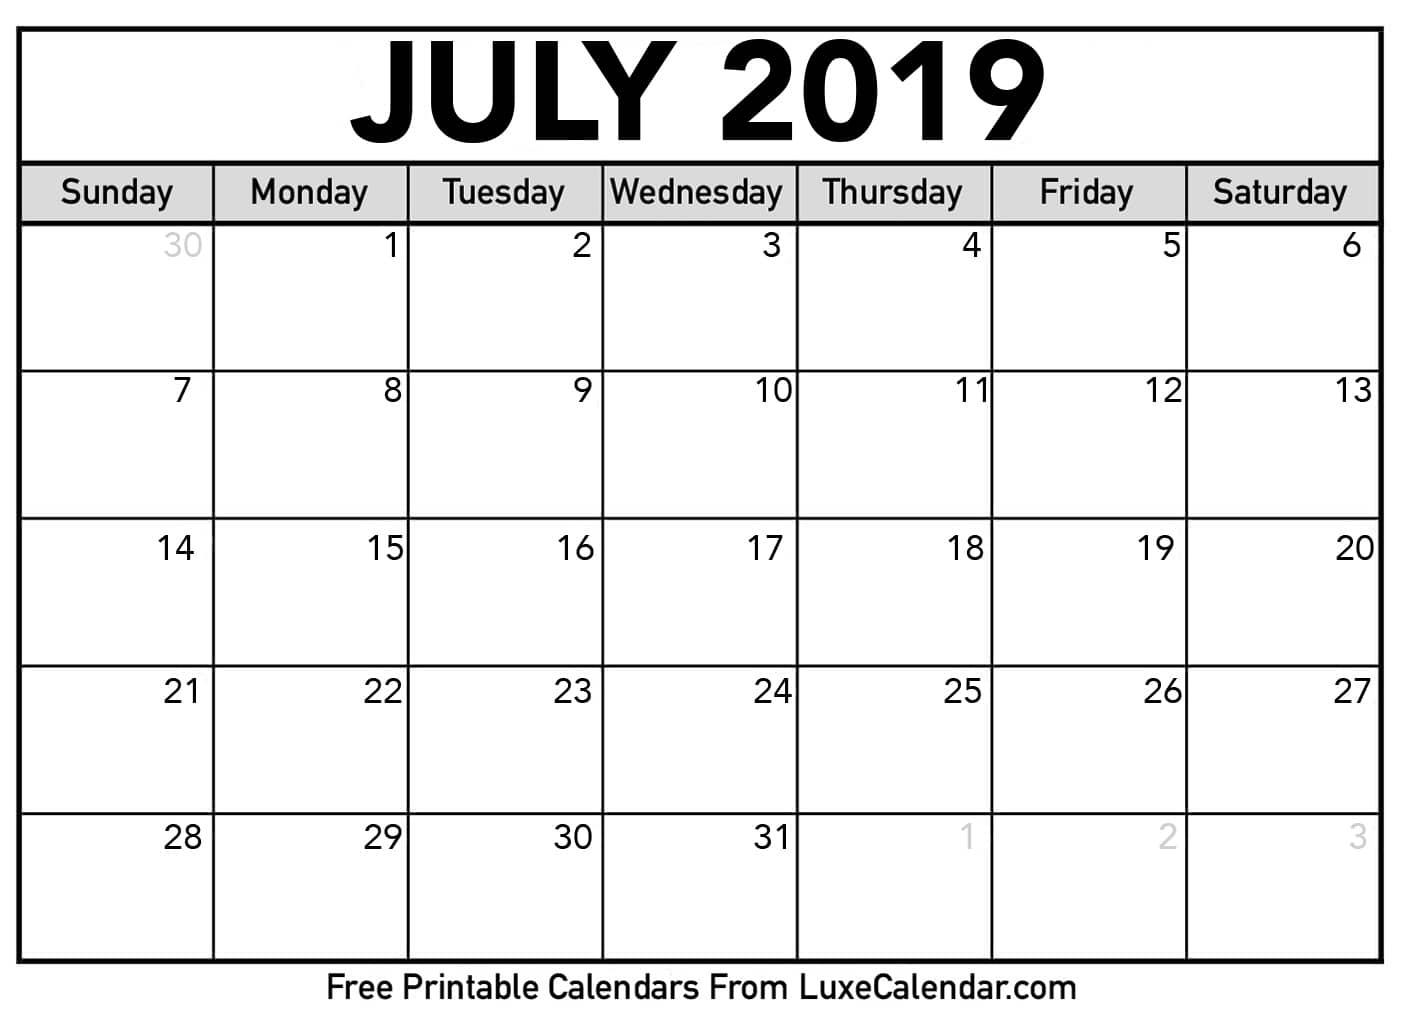 Free July Calendar 2019 Printable